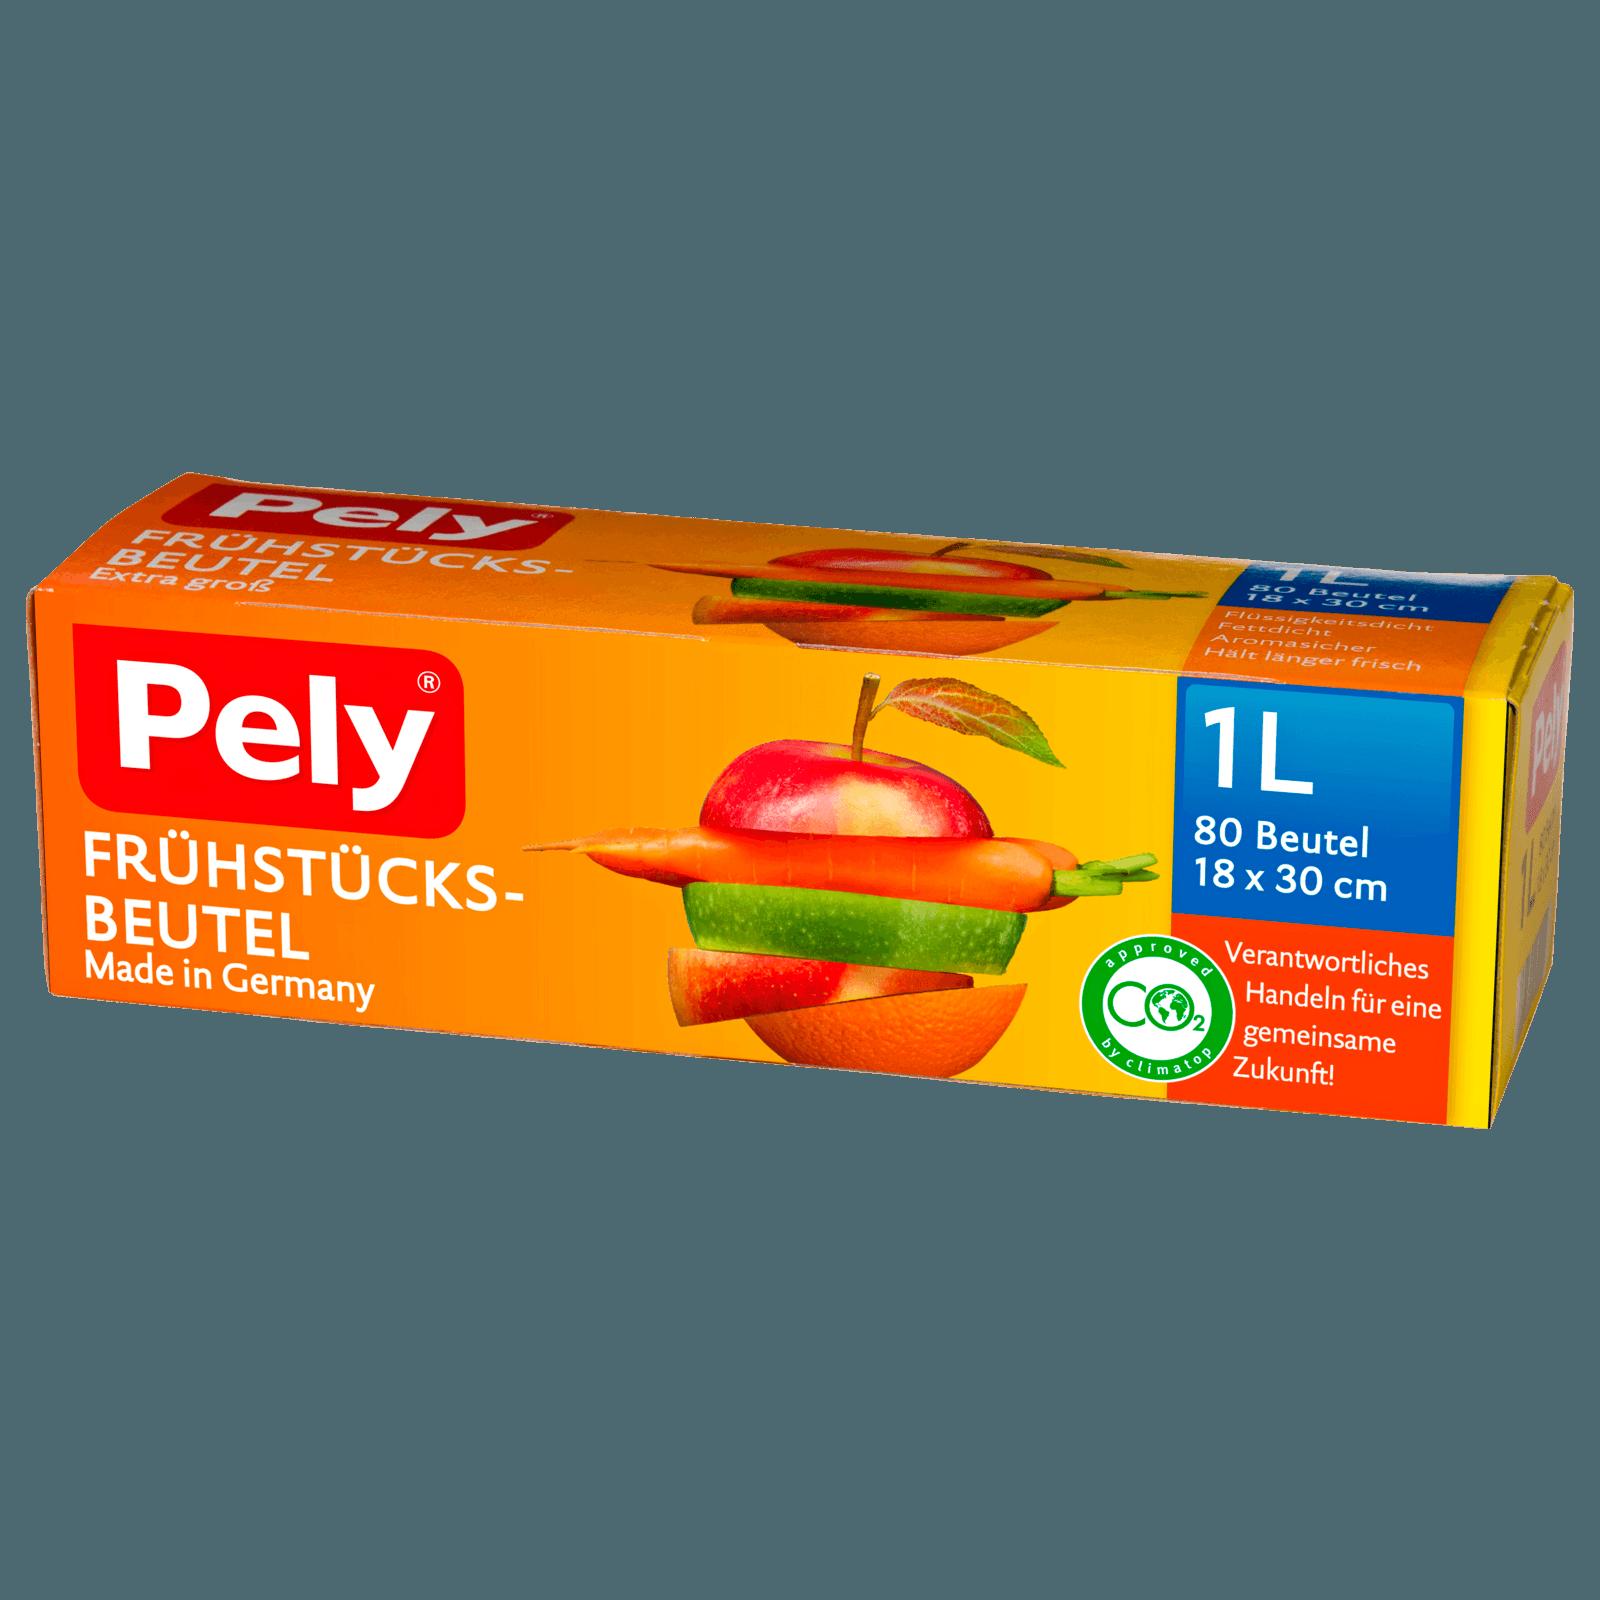 Pely Frühstücksbeutel 80 Stück